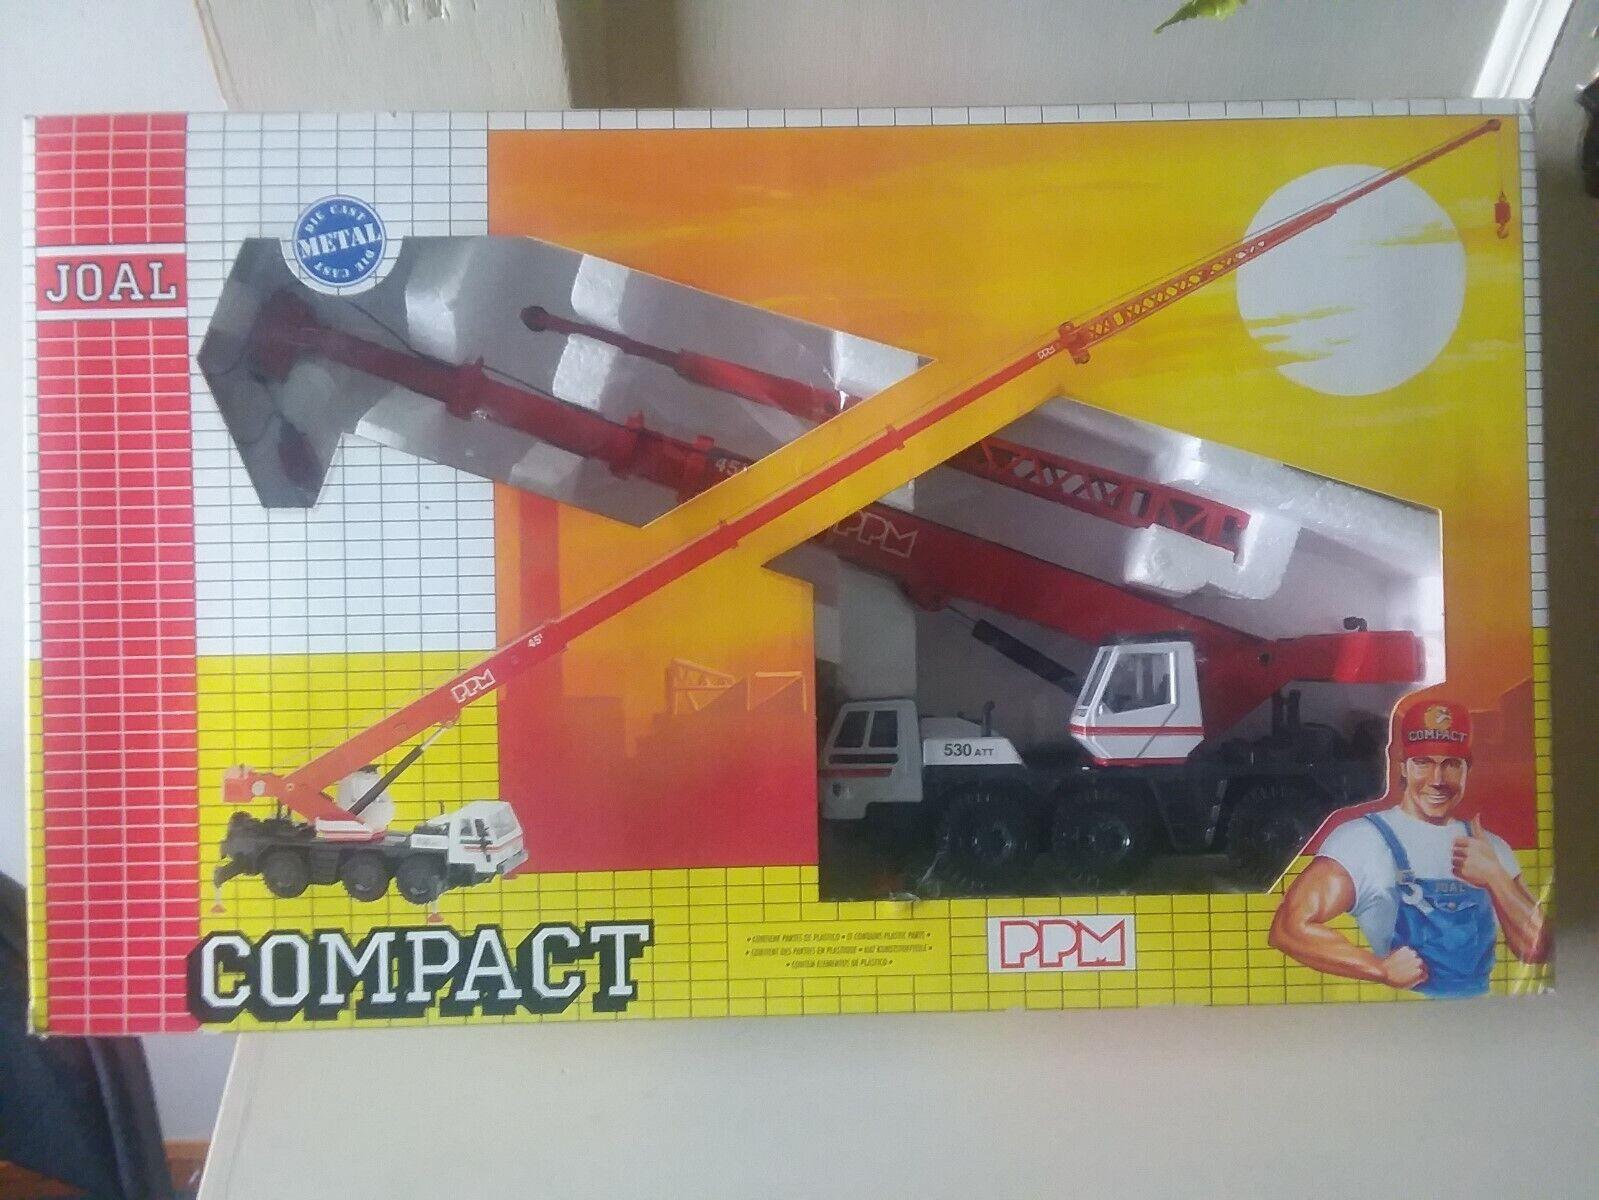 JOAL PPM 530ATT Crane 1 50 Scale REF168